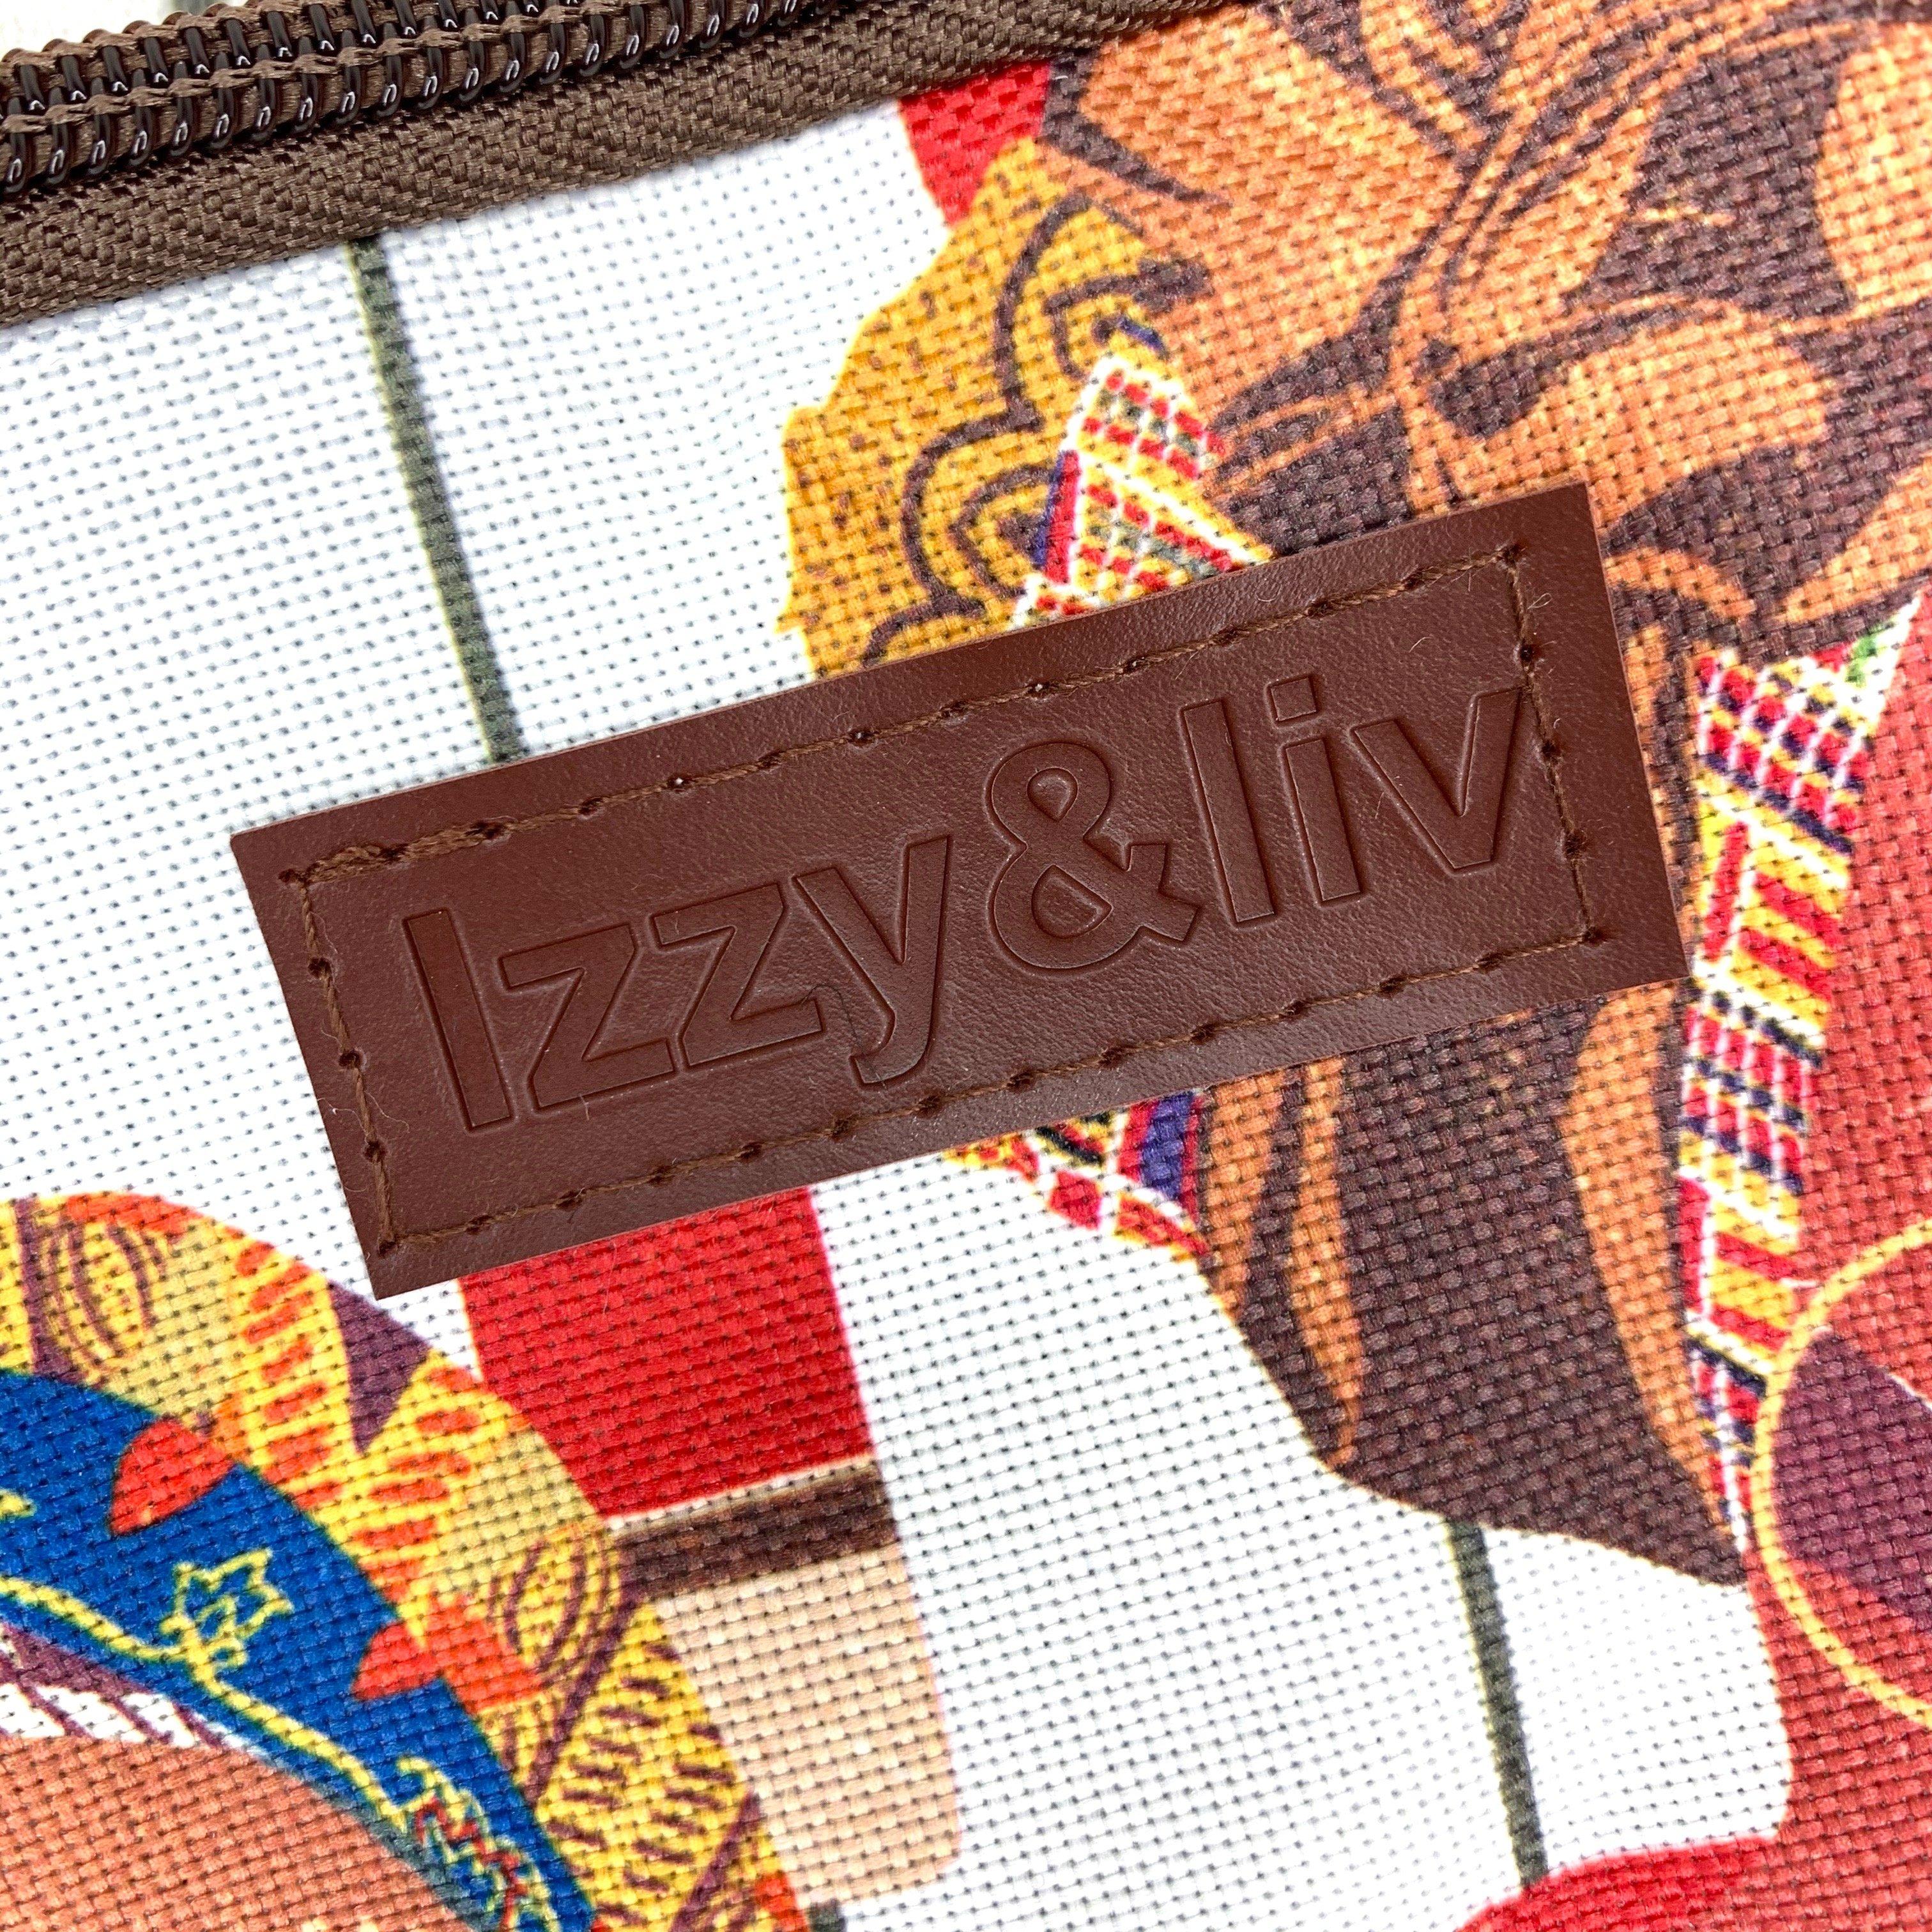 Cosmetic Back Close-Up for Brown Sugar Box April 2020